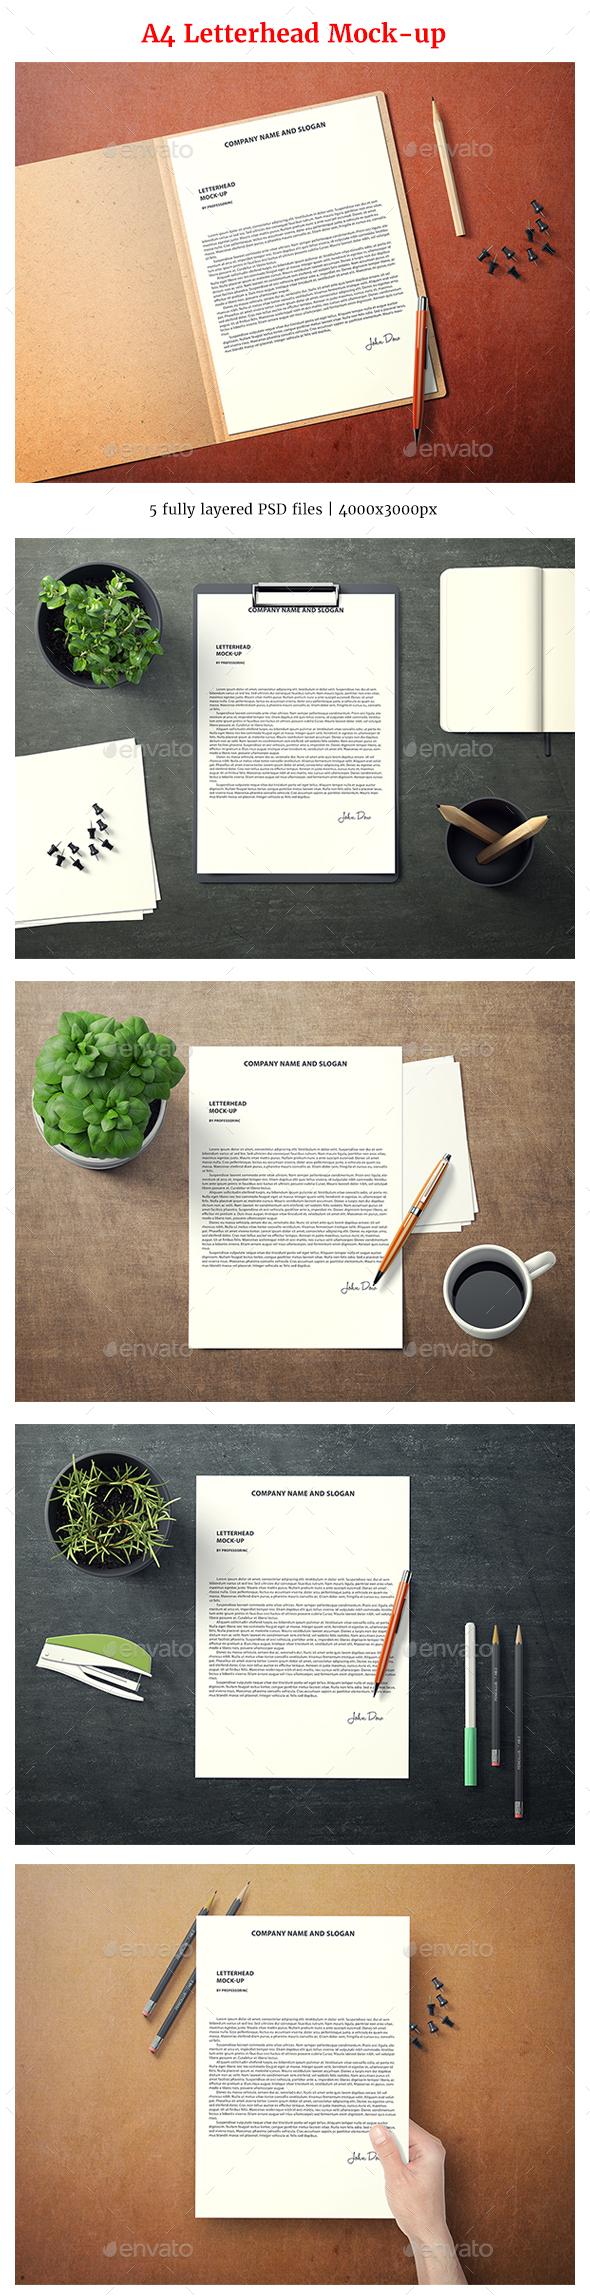 A4 Letterhead Mock-Up - Miscellaneous Print